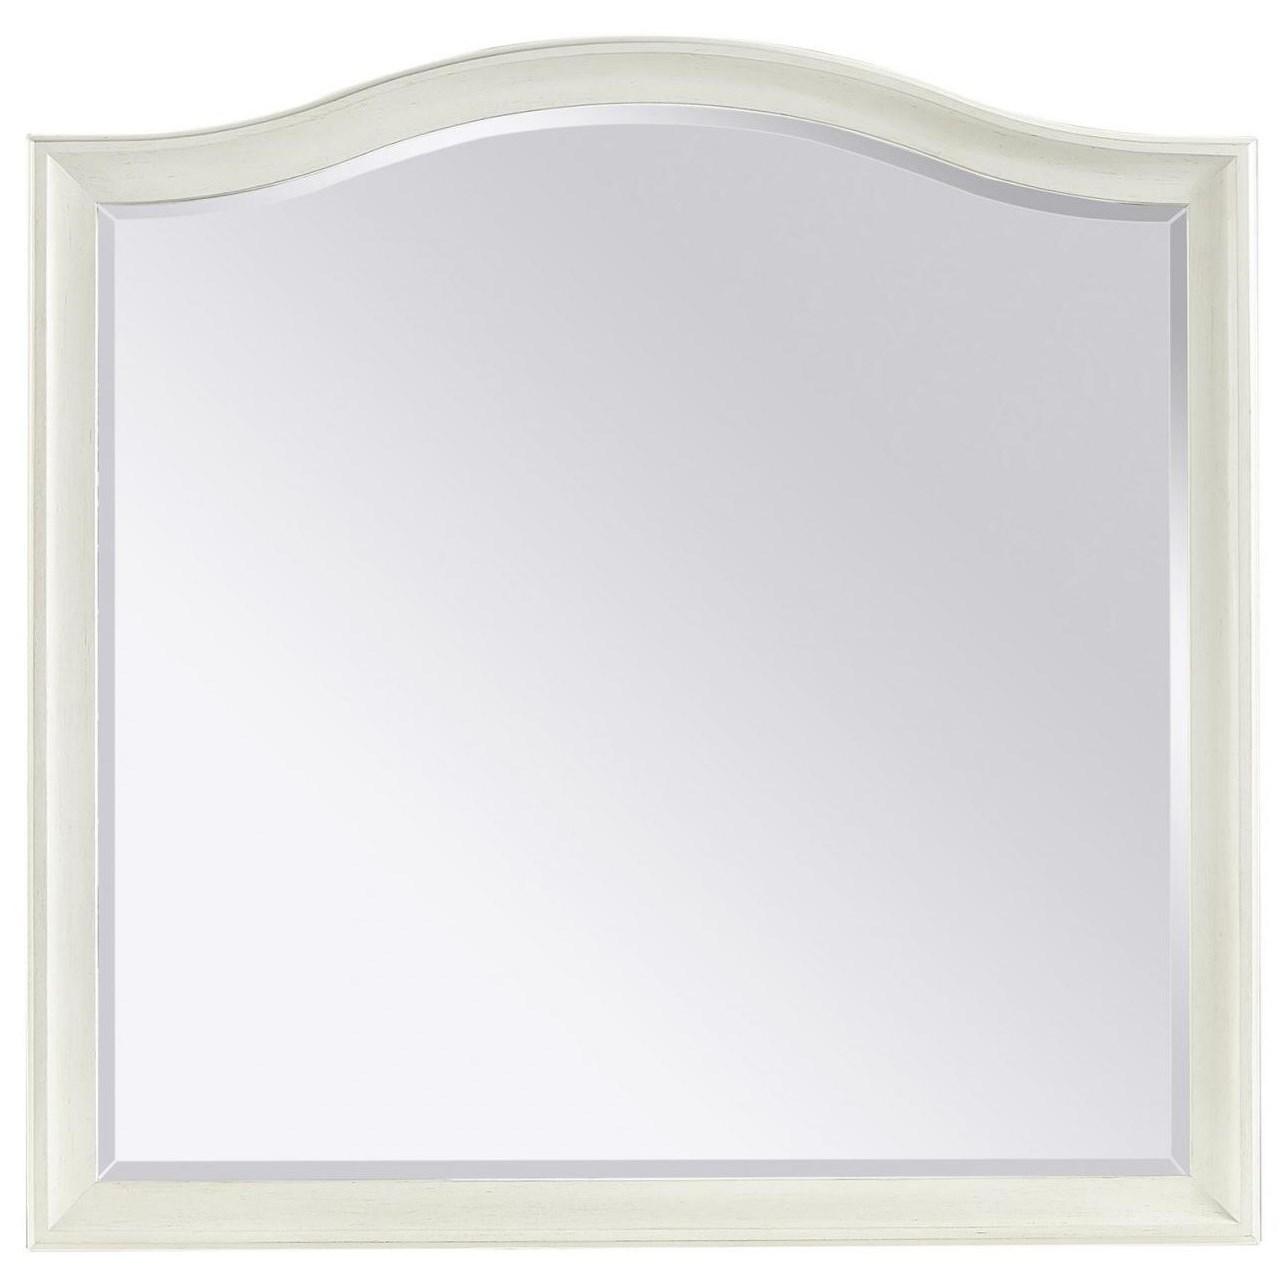 Charlotte  Landscape Mirror by Aspenhome at Walker's Furniture